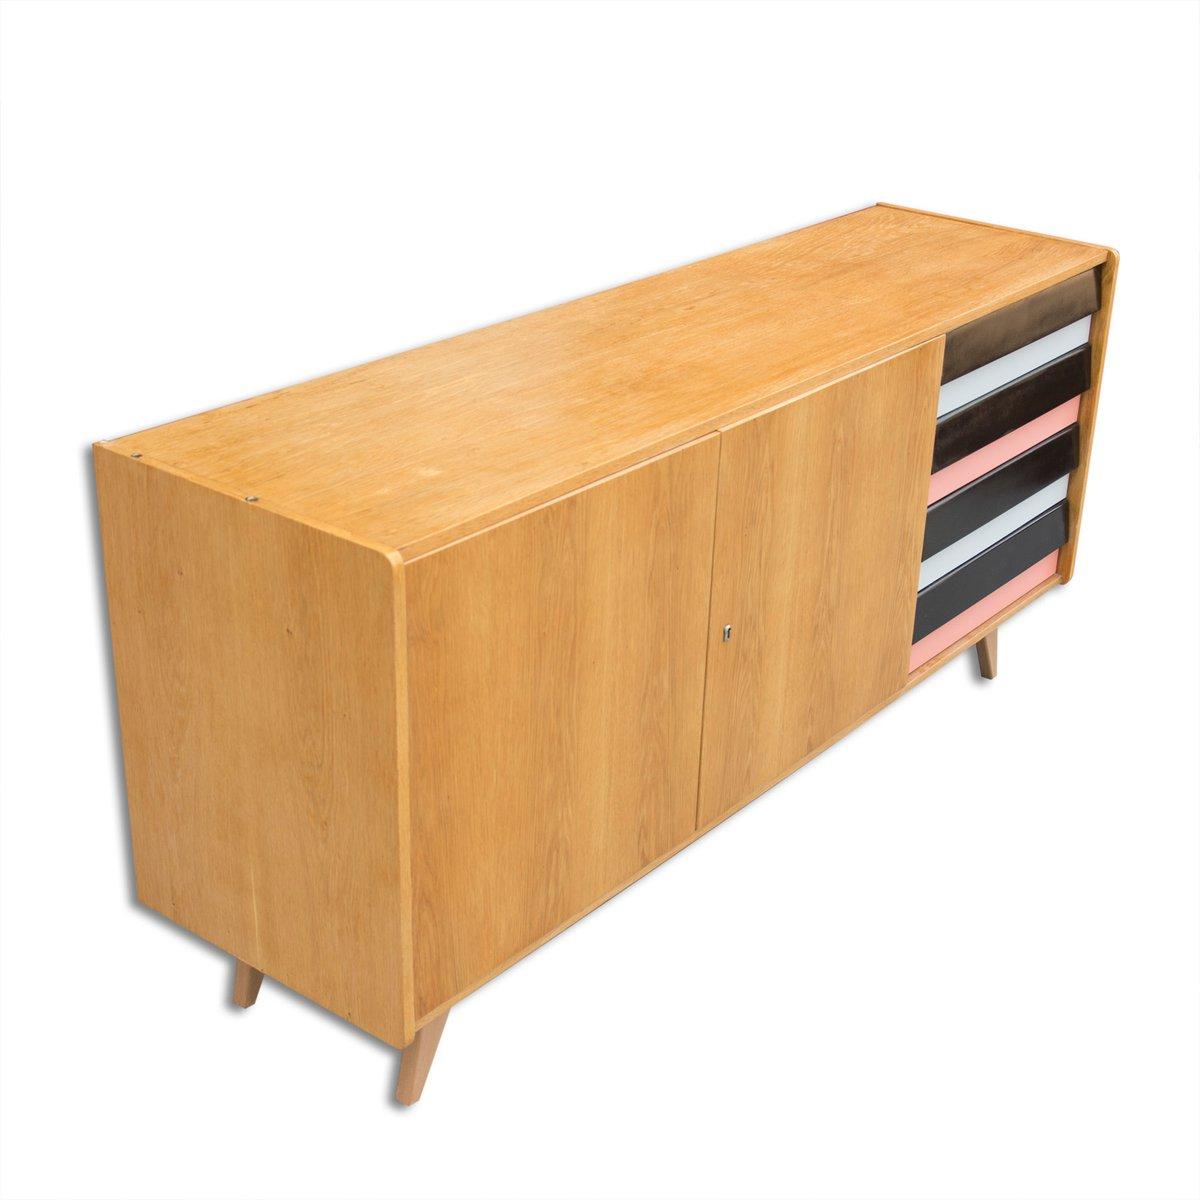 Modell u 460 sideboard von ji jiroutek f r interier for Sideboard 4 meter lang